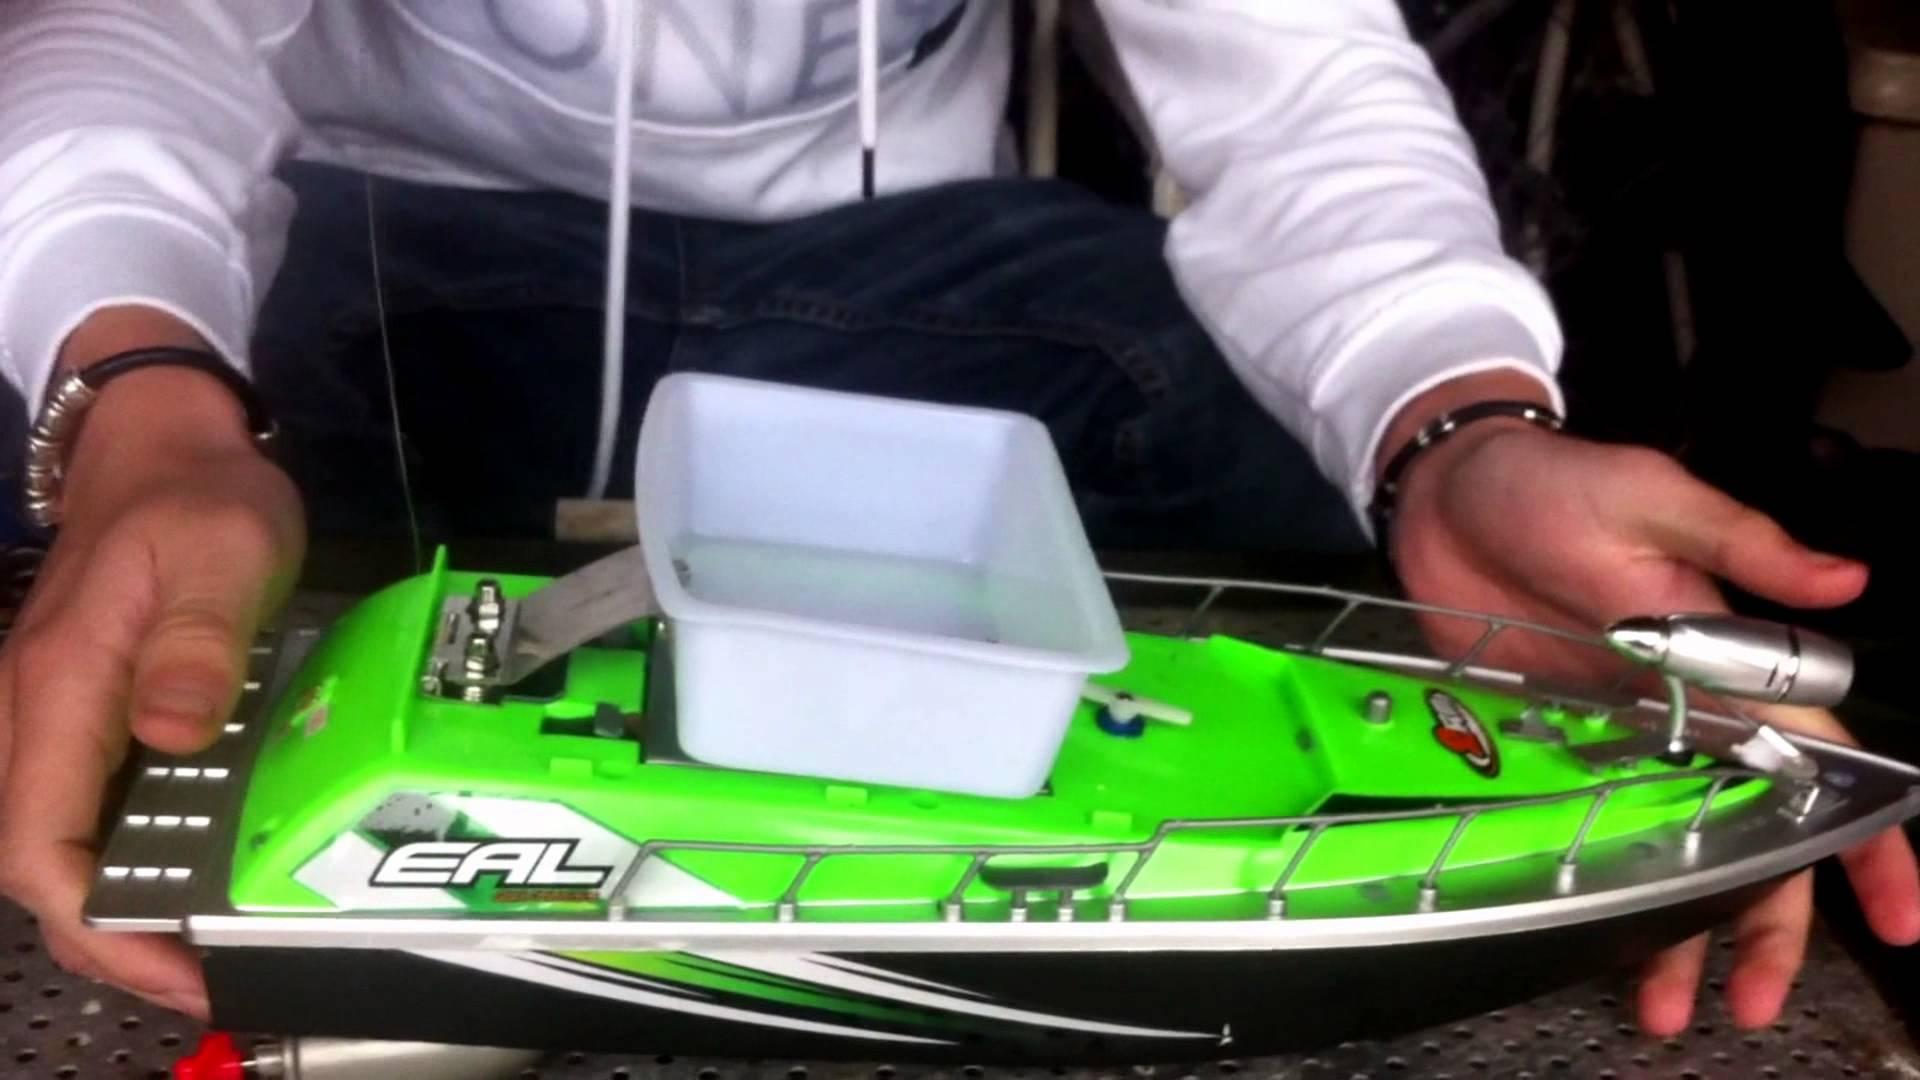 bateau amorceur utilisation